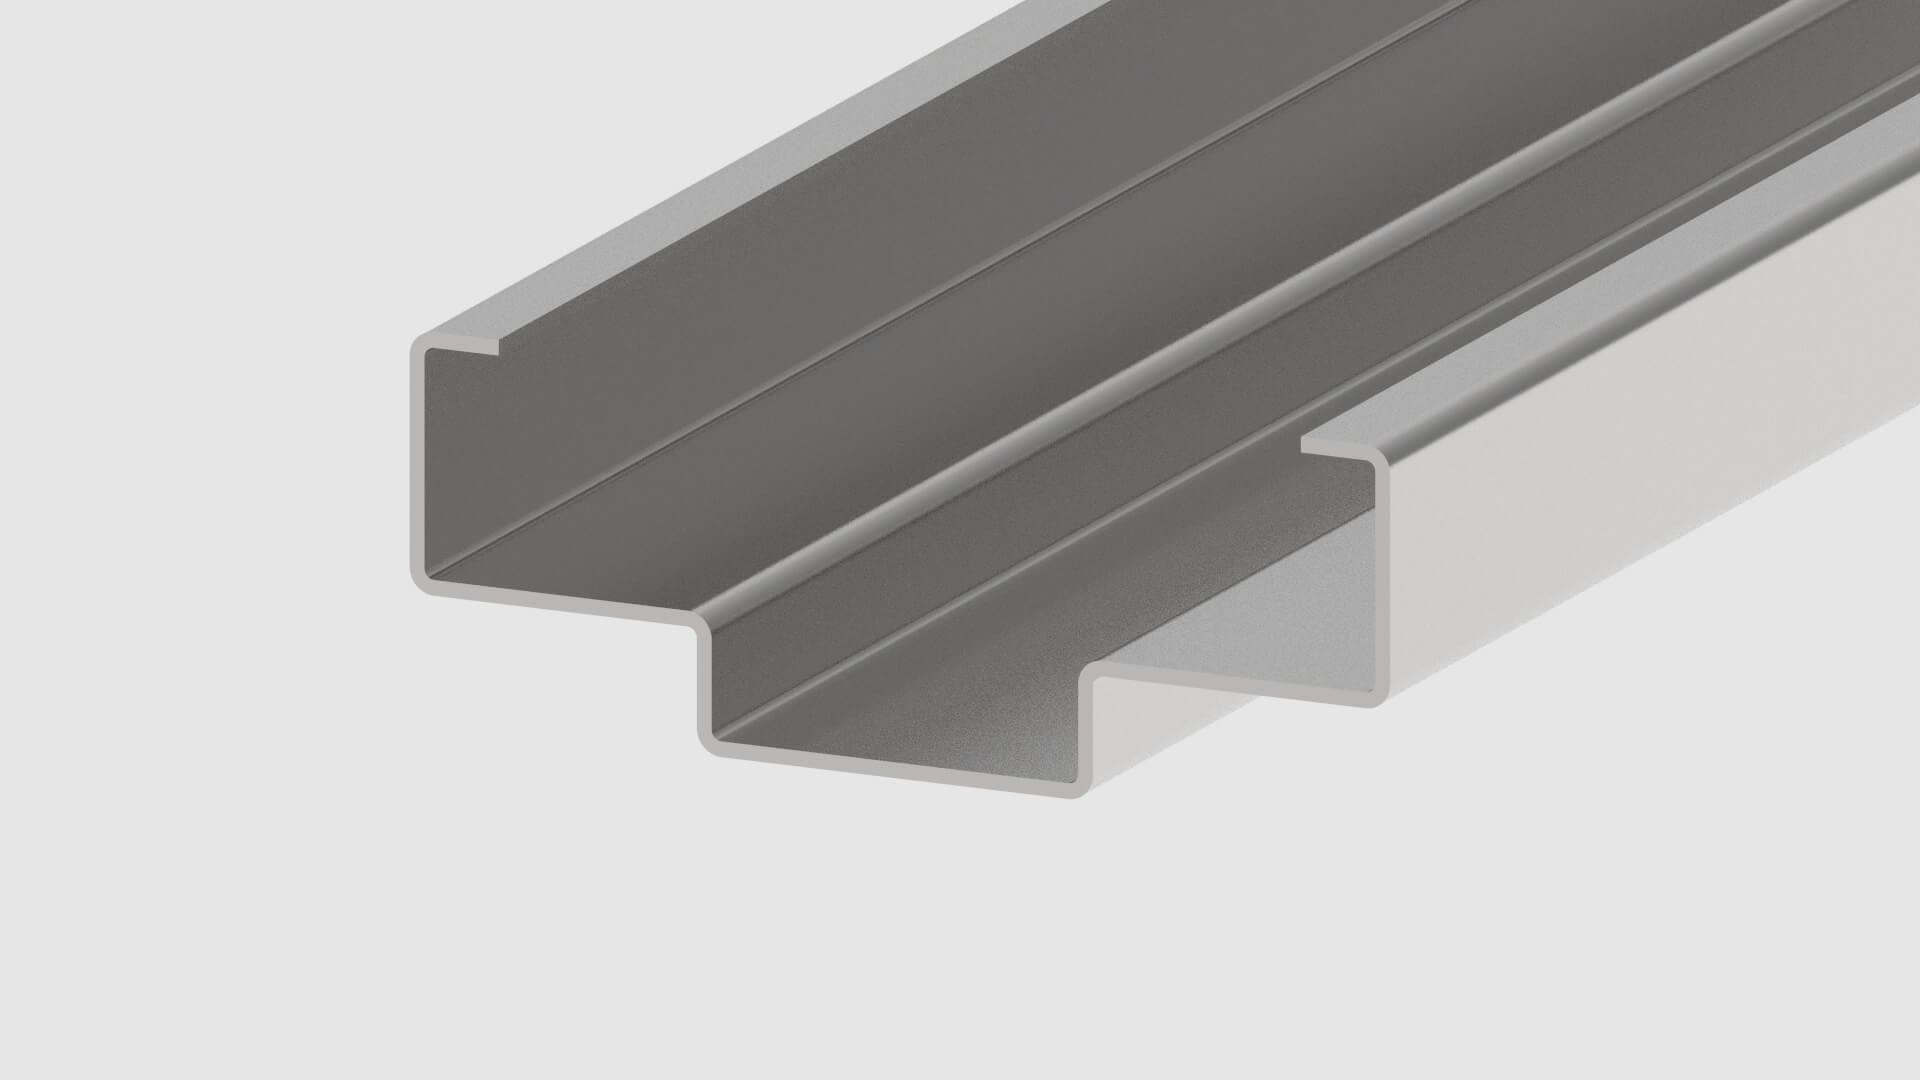 WEMO picture of a Steel Door Frame product